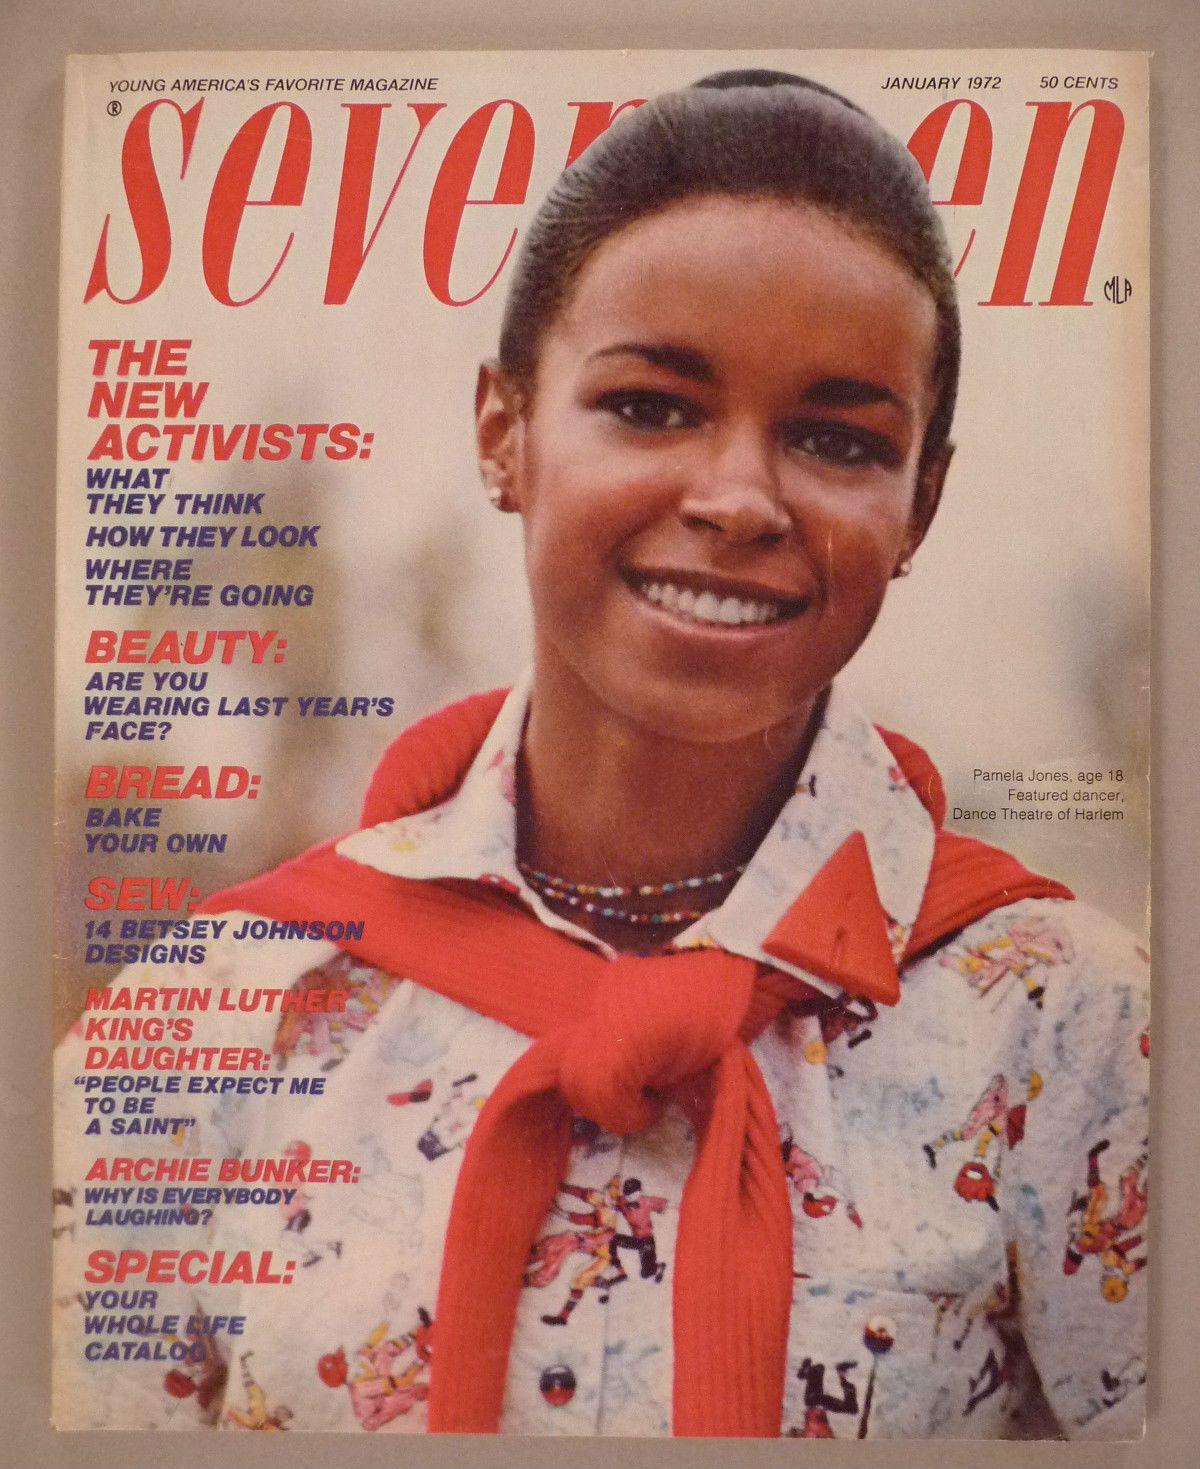 seventeen february 1972 - Google Search